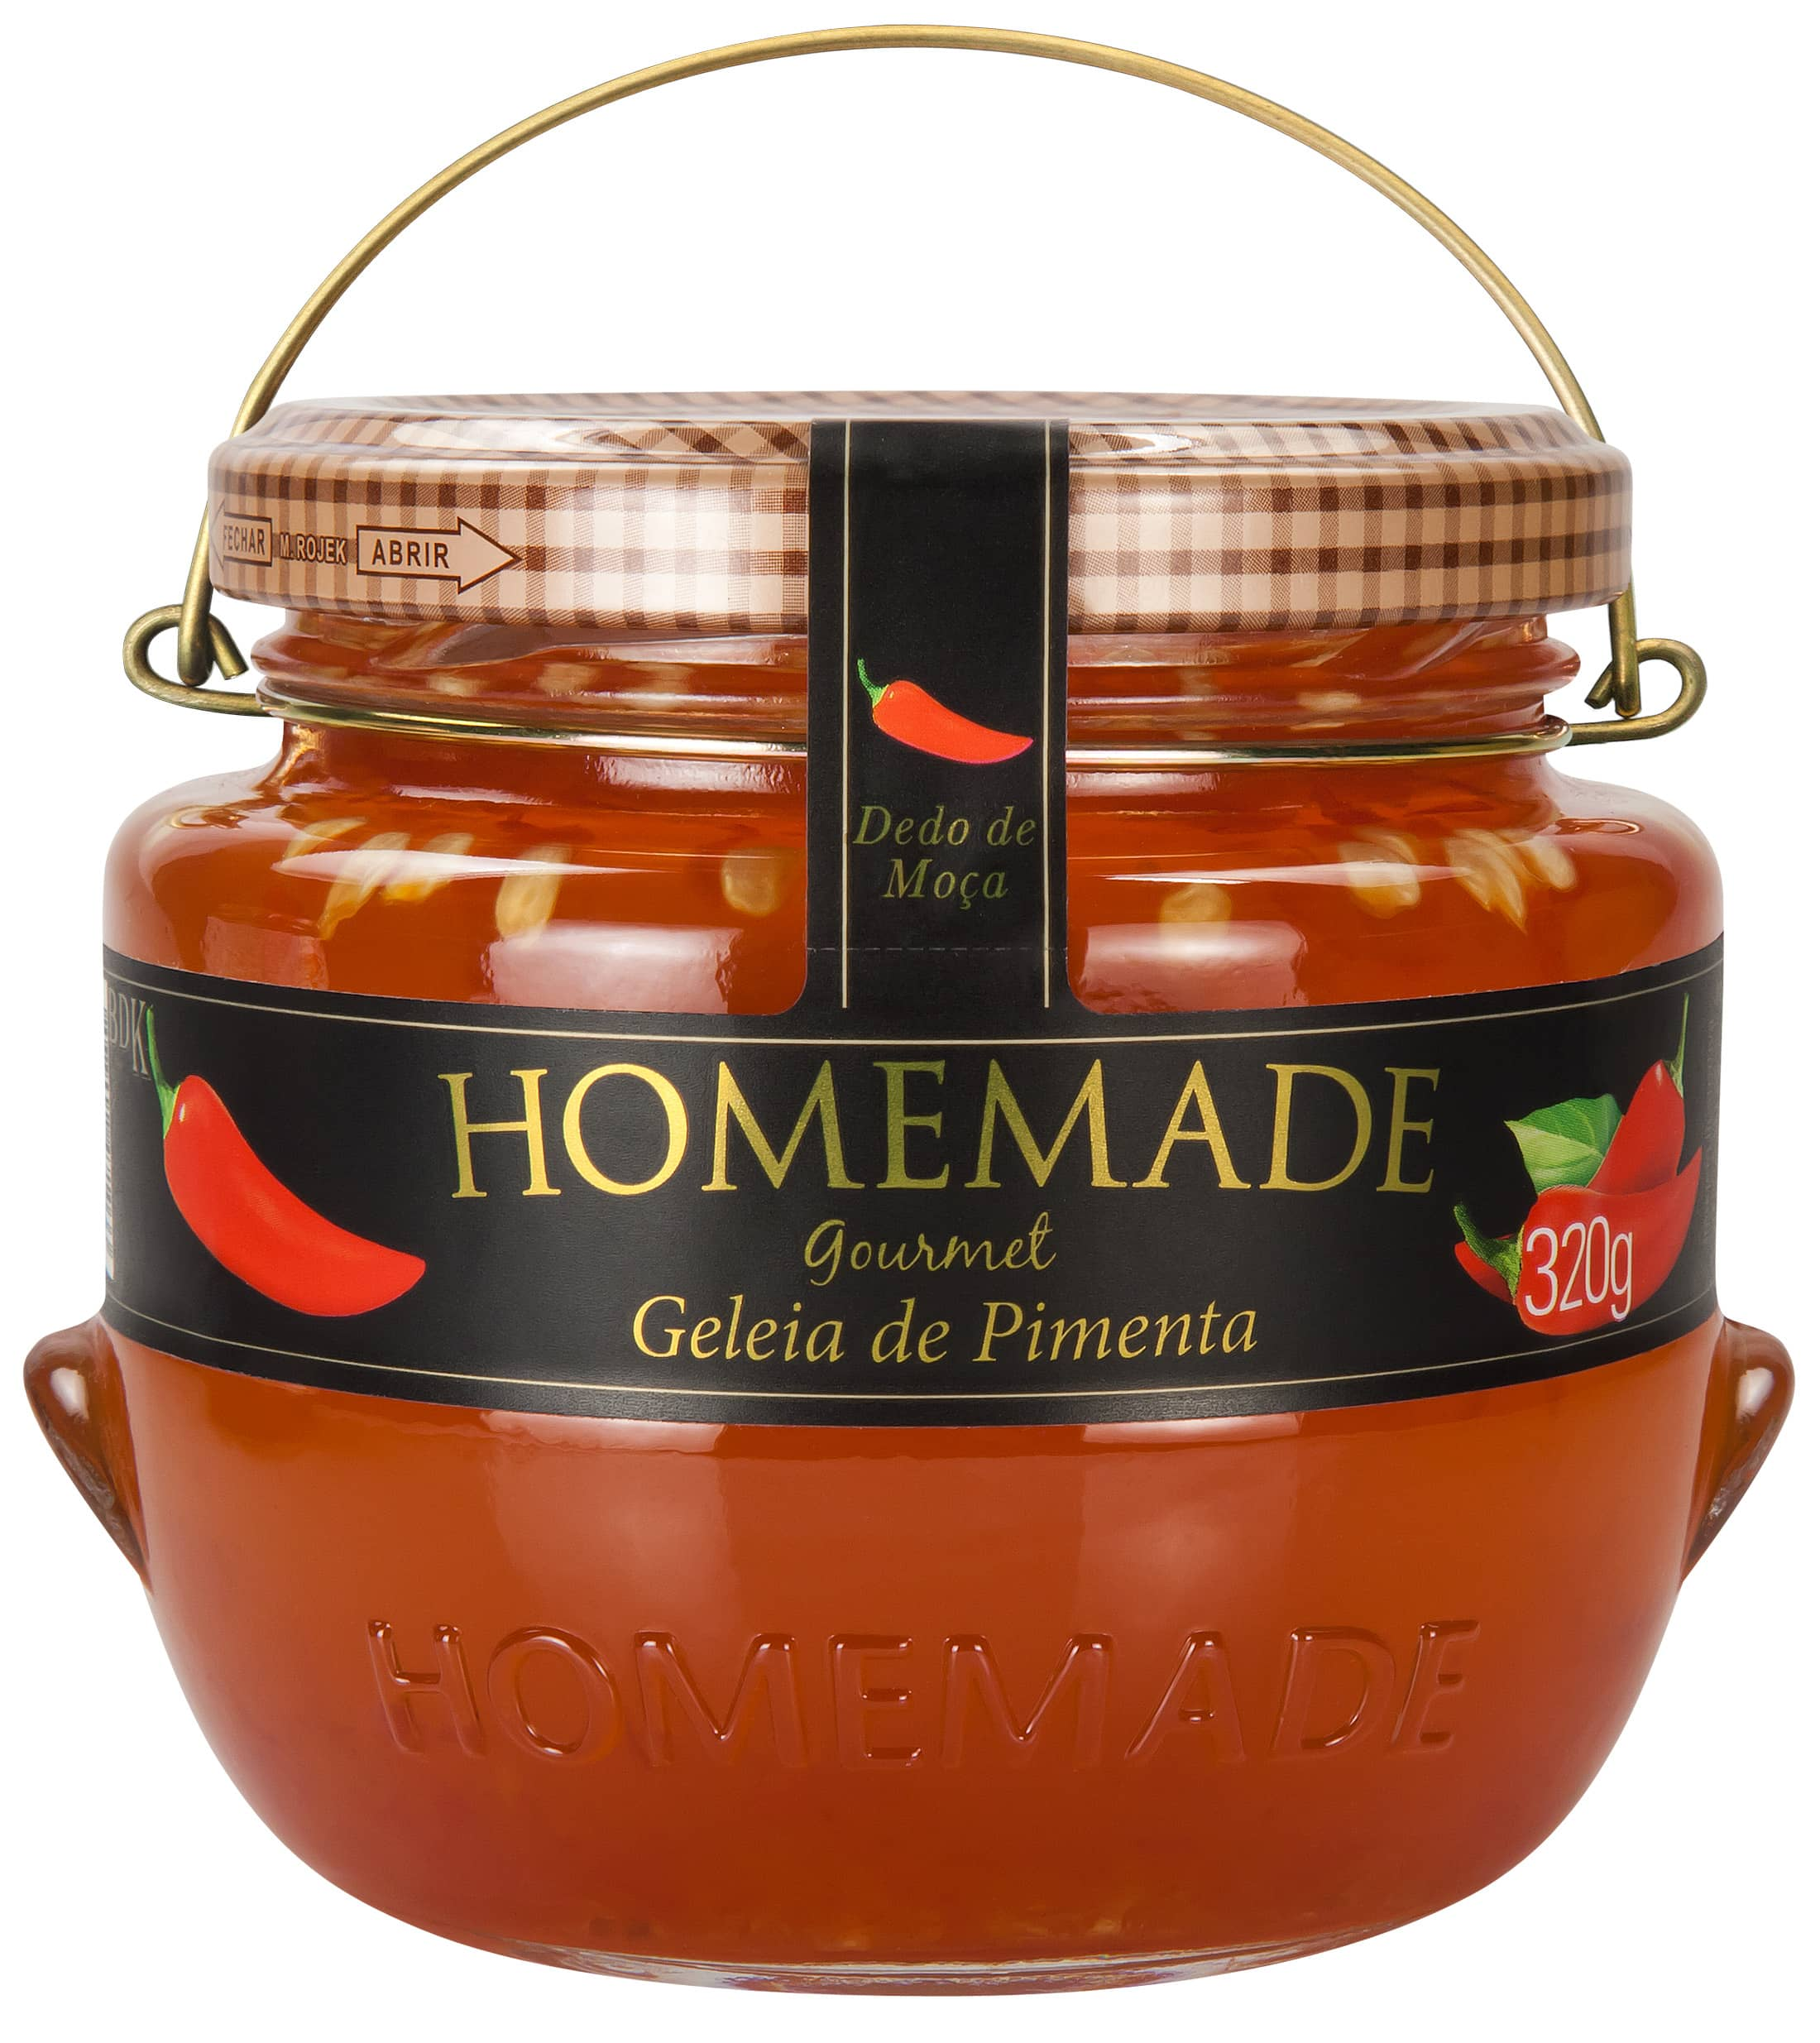 Homemade-EmbalagemMarca